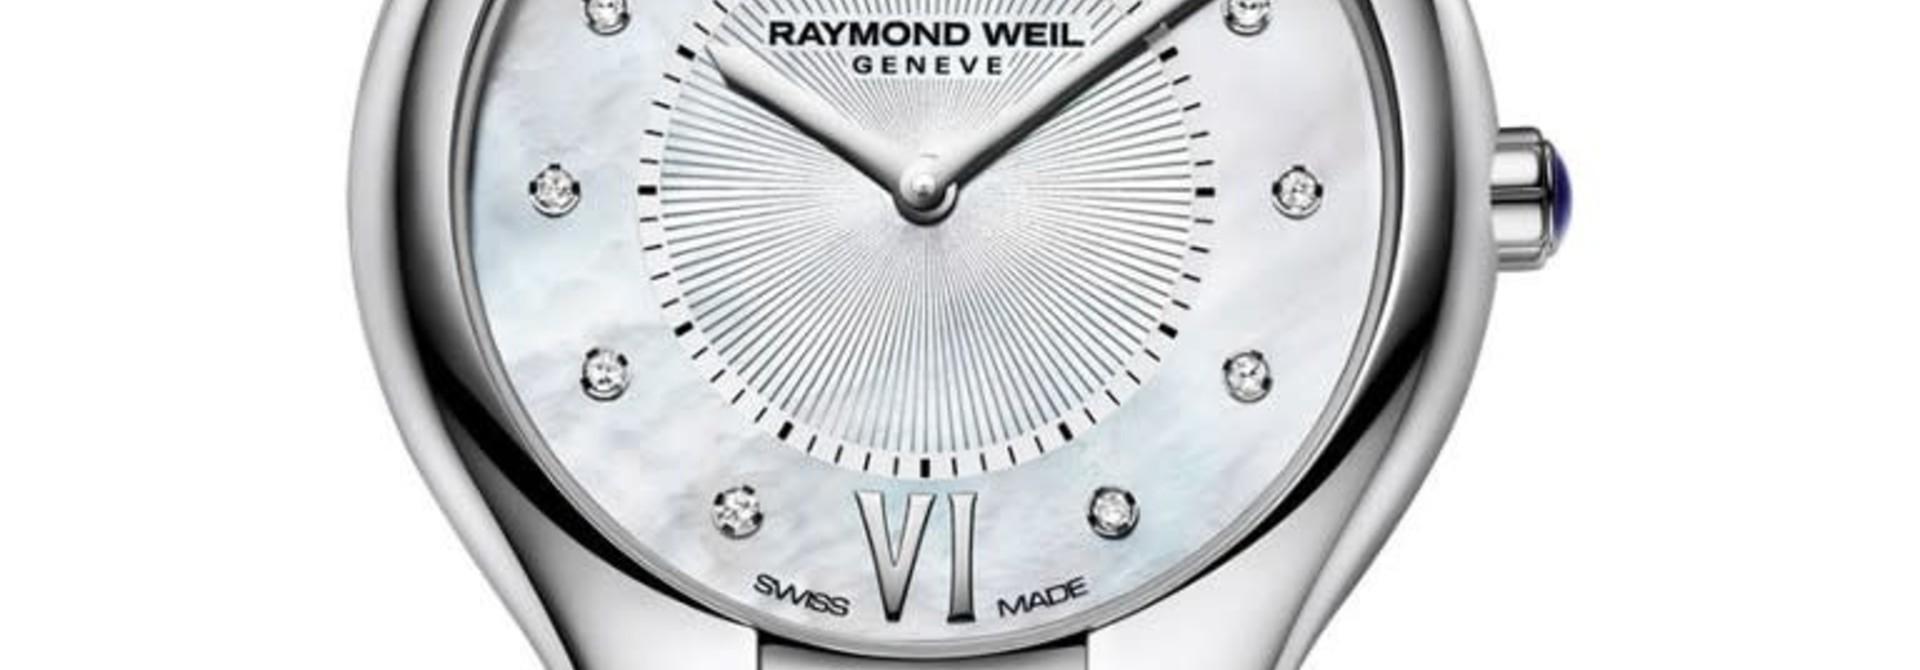 Raymond Weil Noemia 5132 -St -00 985